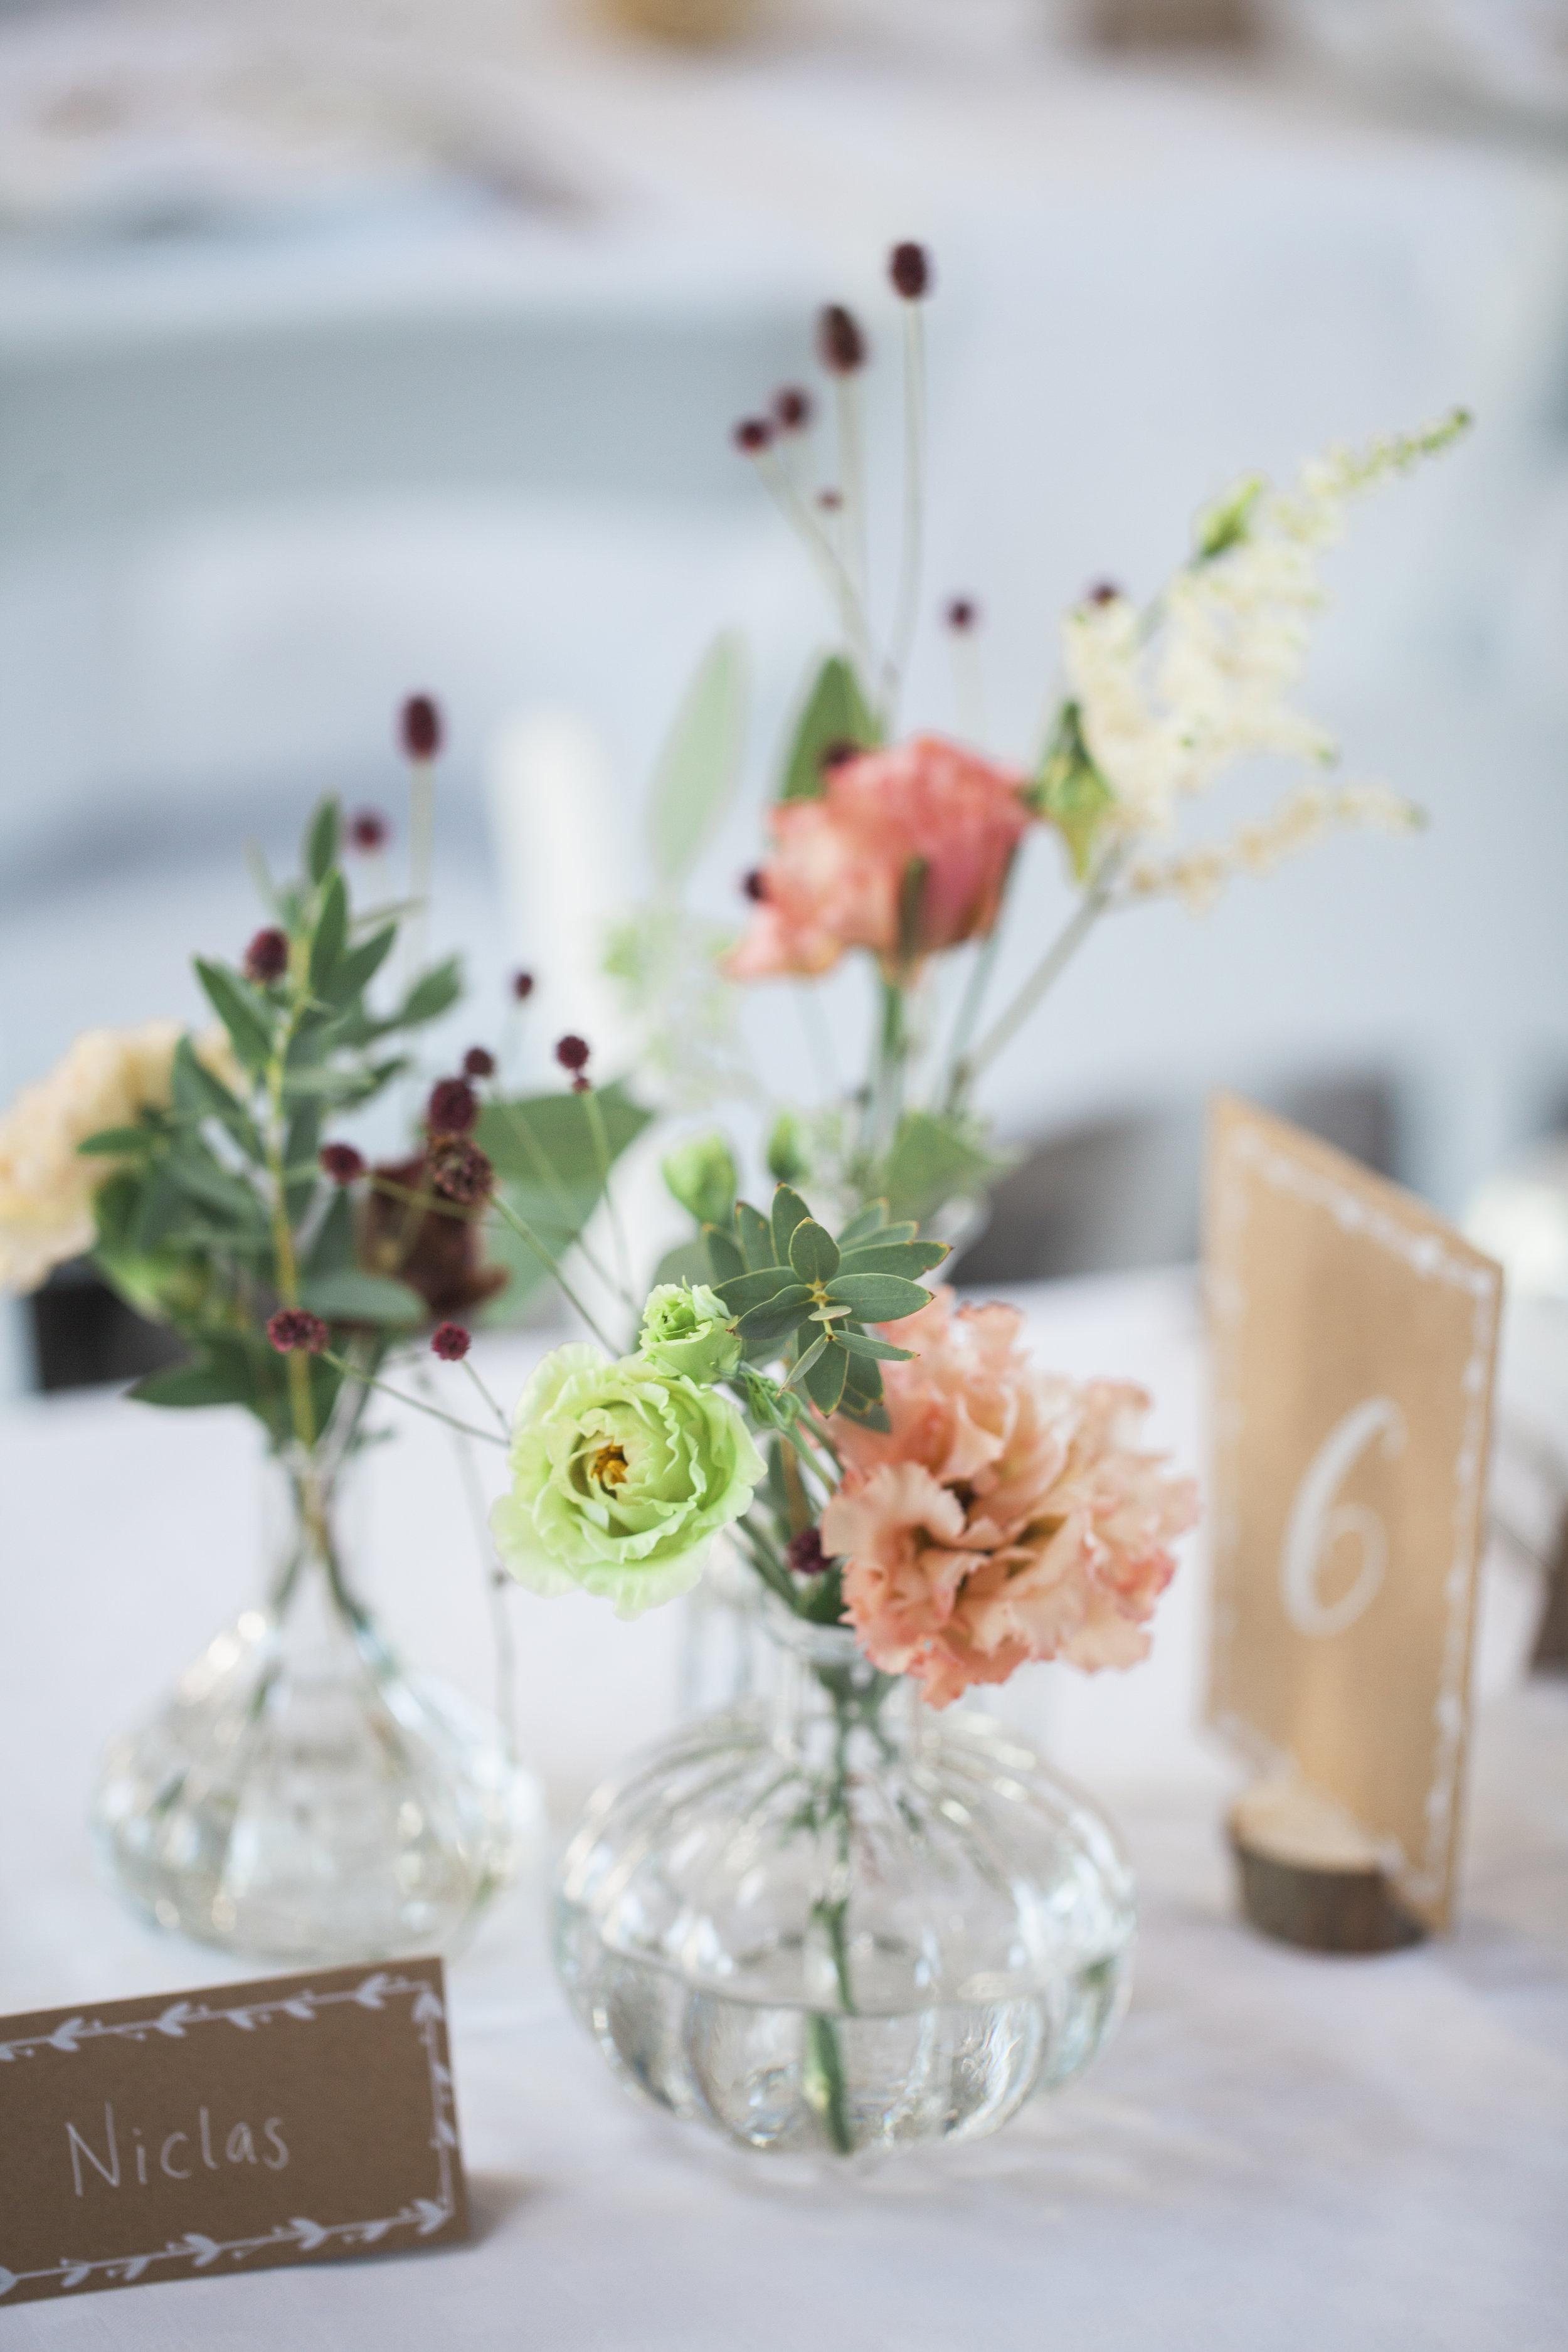 Bröllop-192.jpg